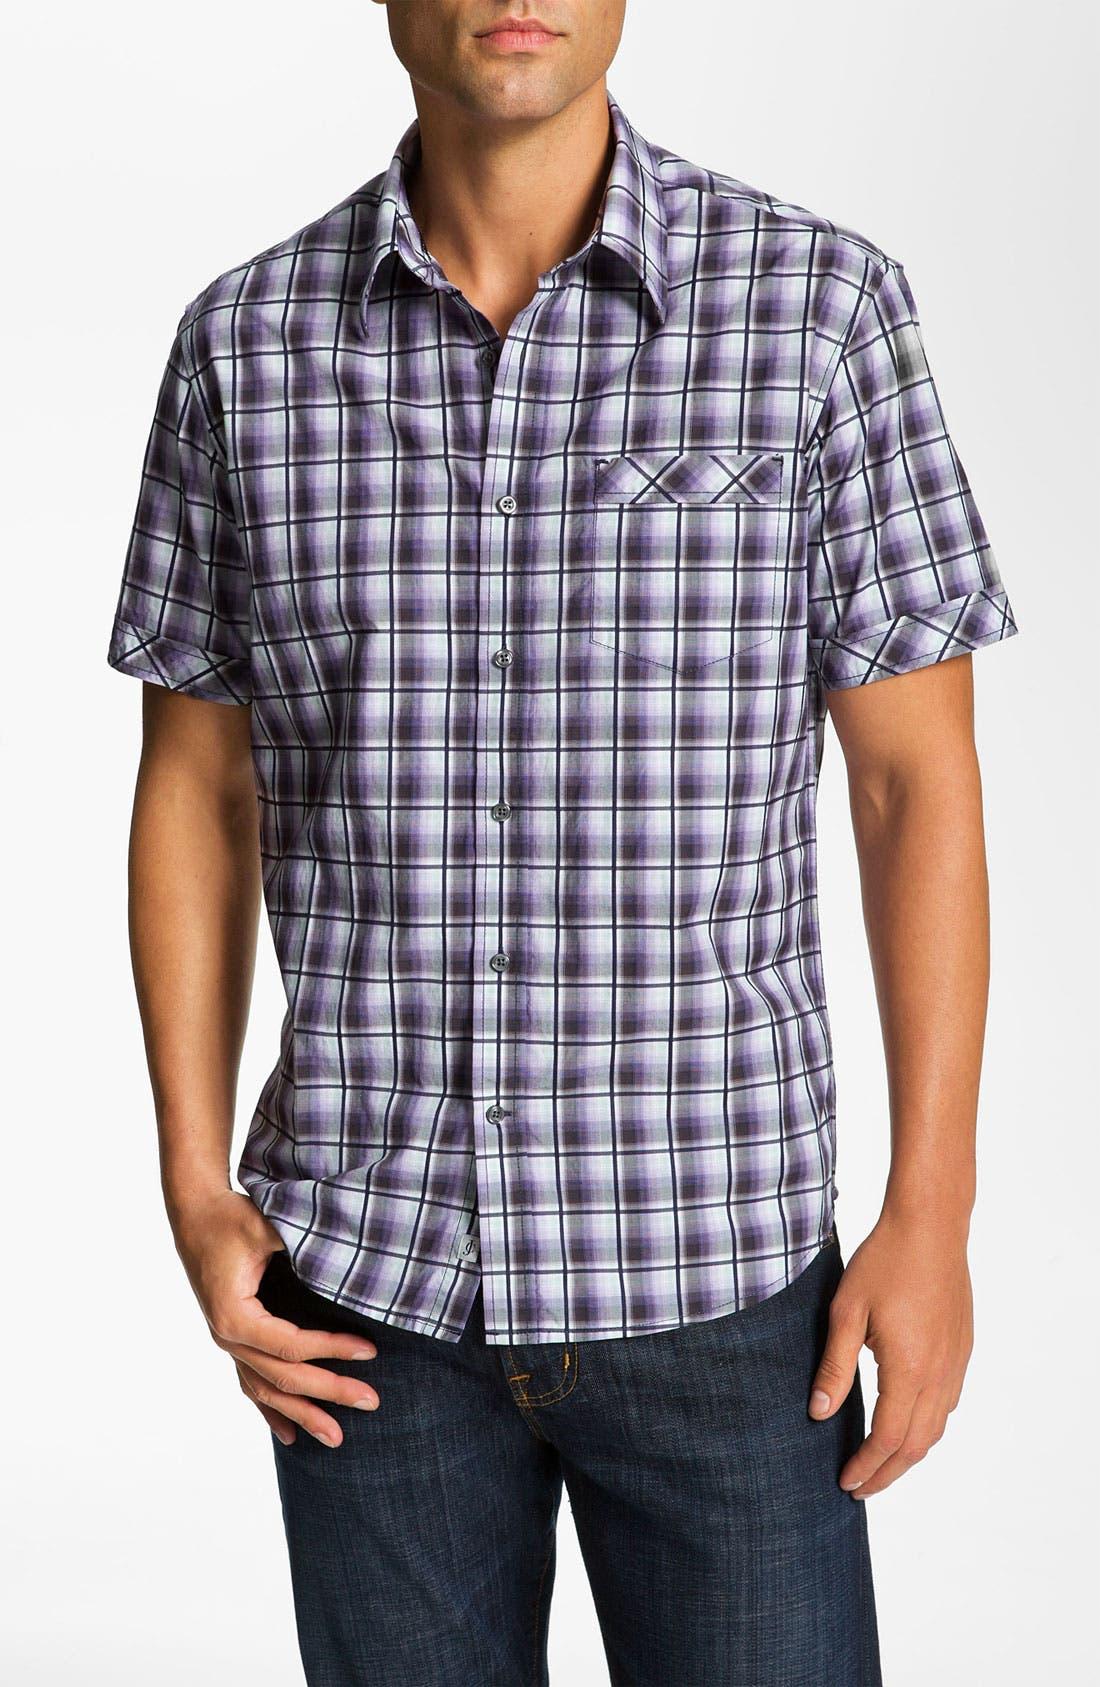 Alternate Image 1 Selected - James Campbell 'Pecos' Plaid Sport Shirt